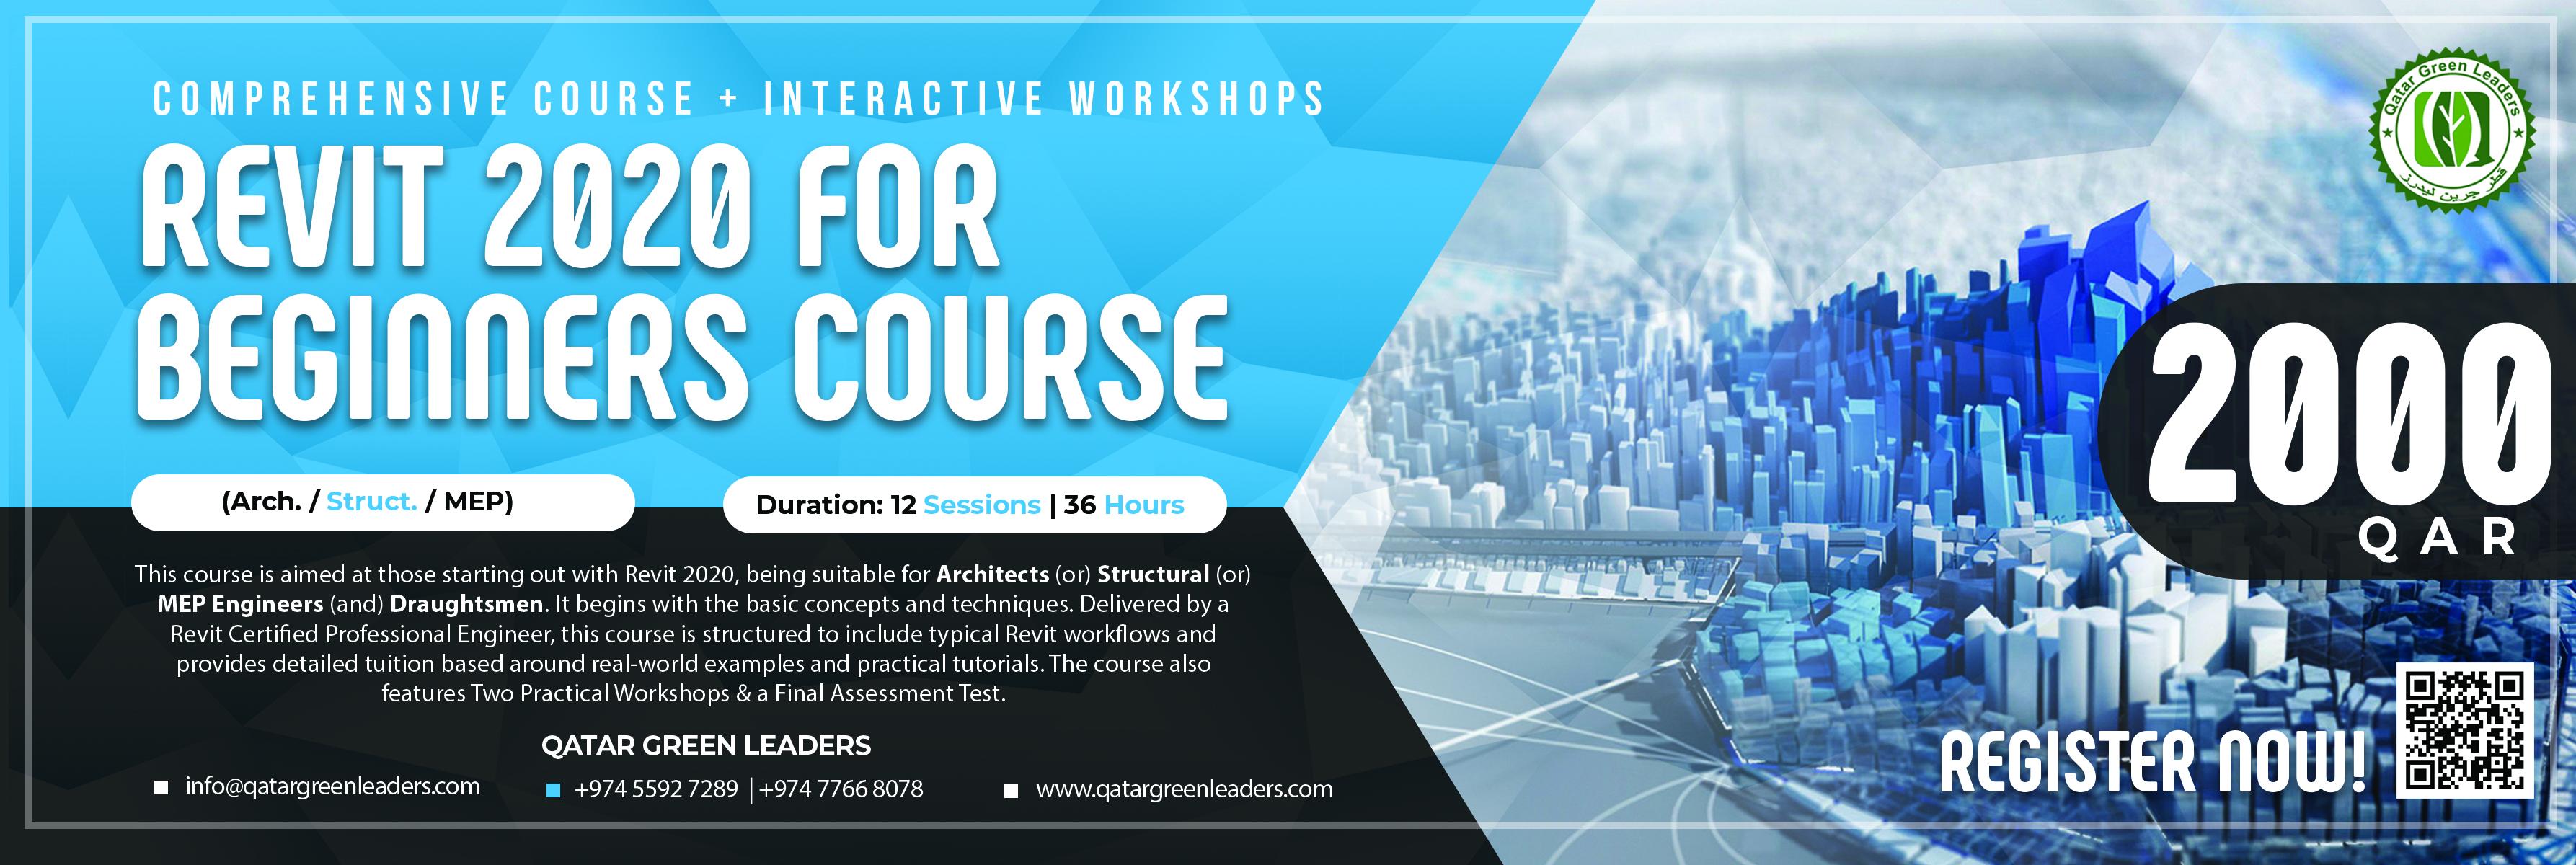 REVIT Courses - Qatar Green Leaders